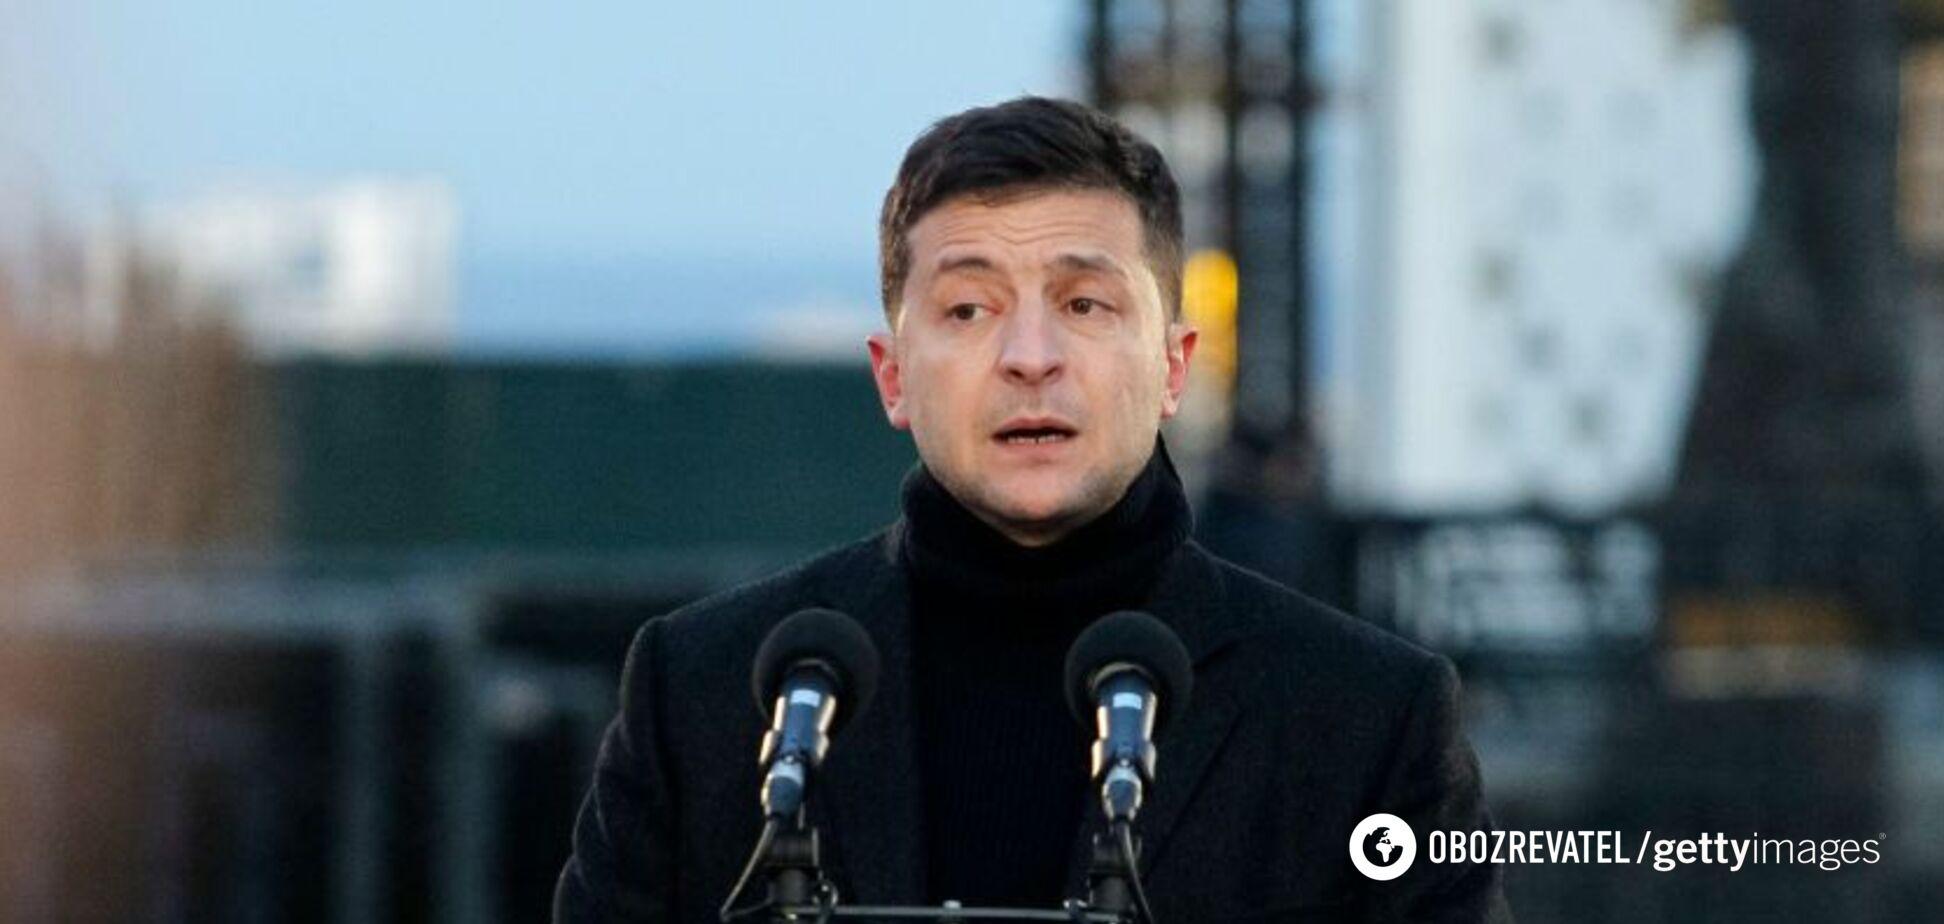 'Подарок не взяли': Зеленский отчитался о громком обещании перед украинцами